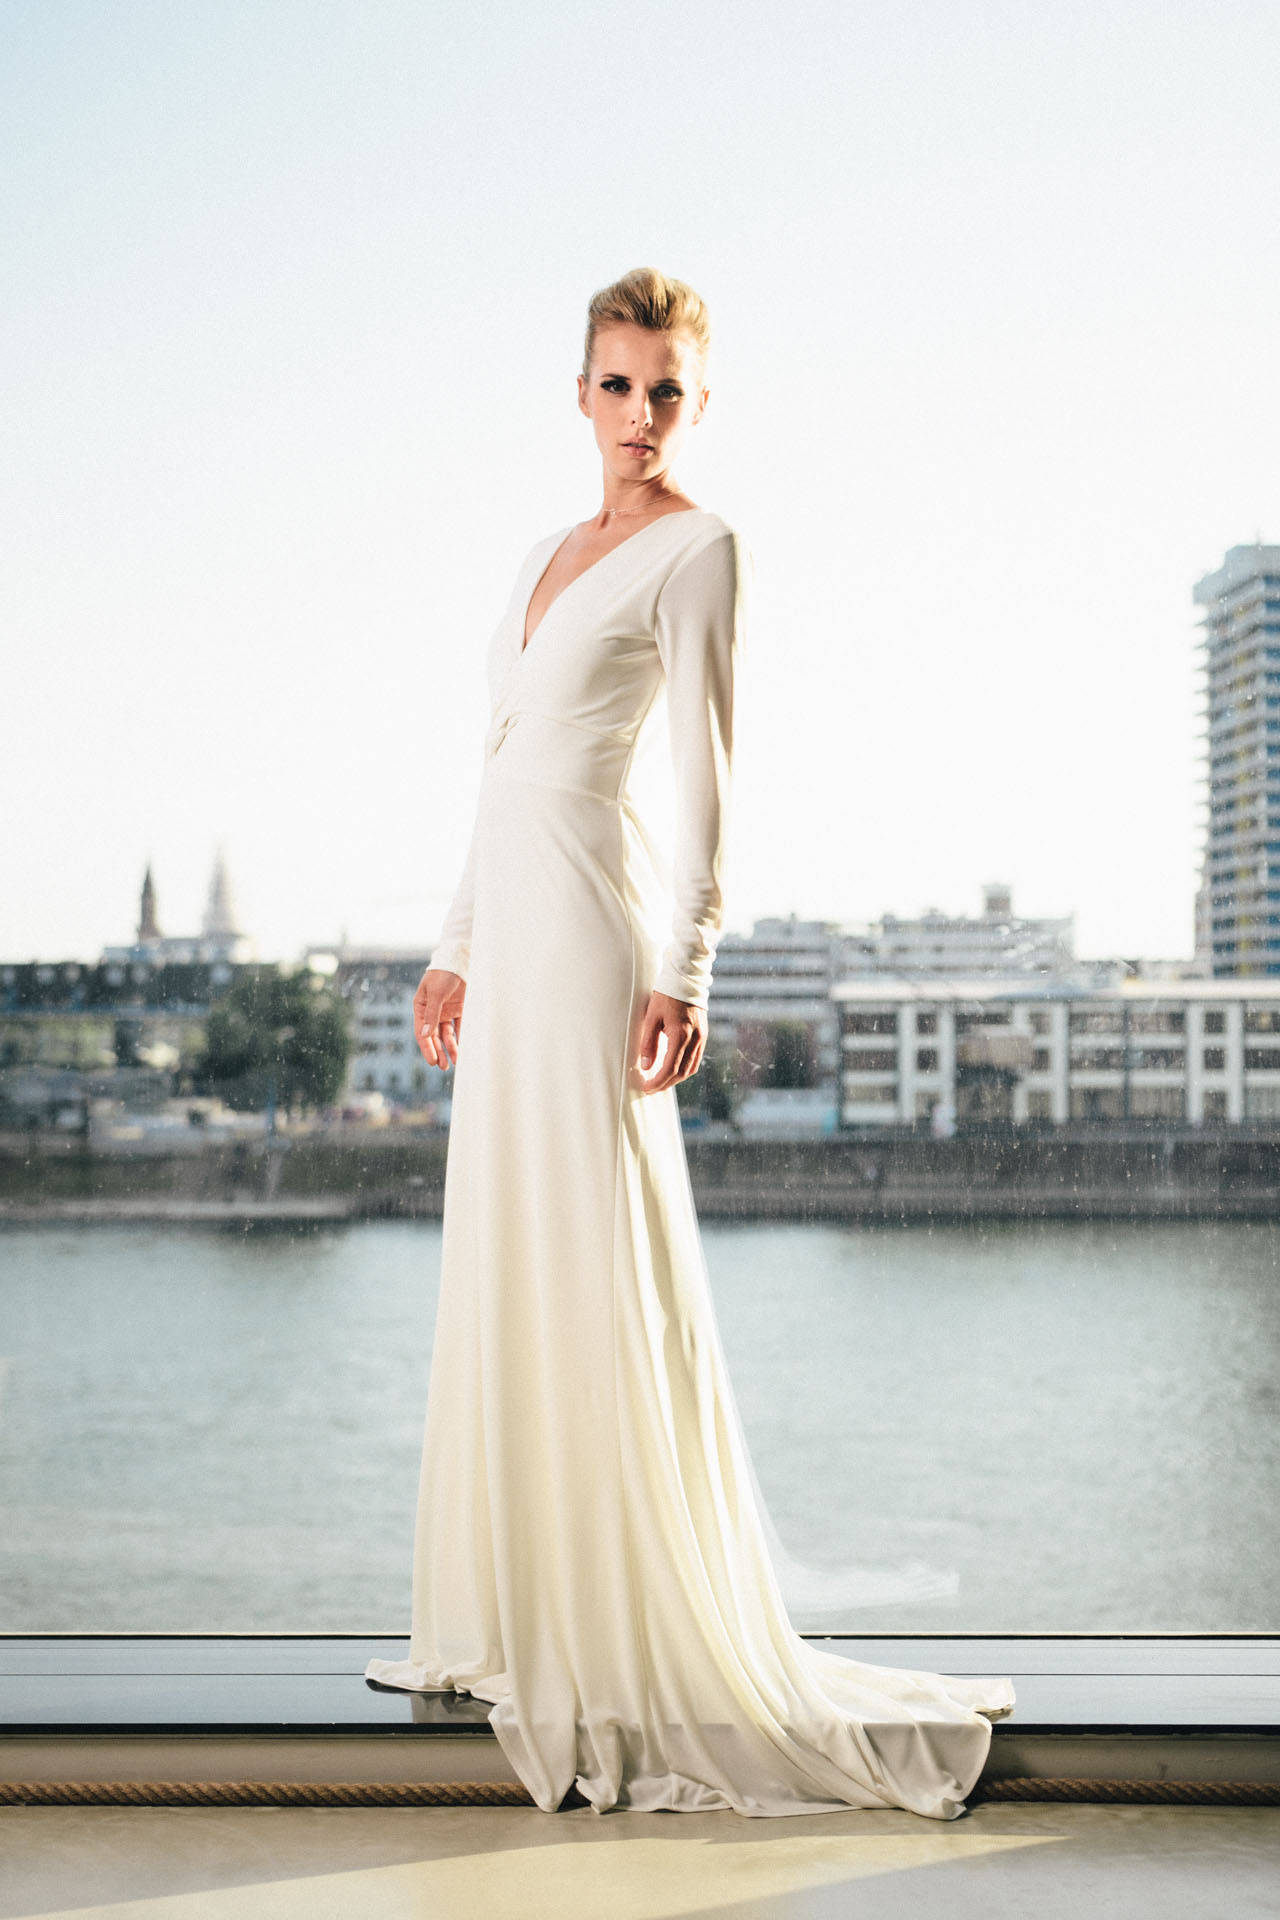 kuessdiebraut-gwyneth-pearl-4